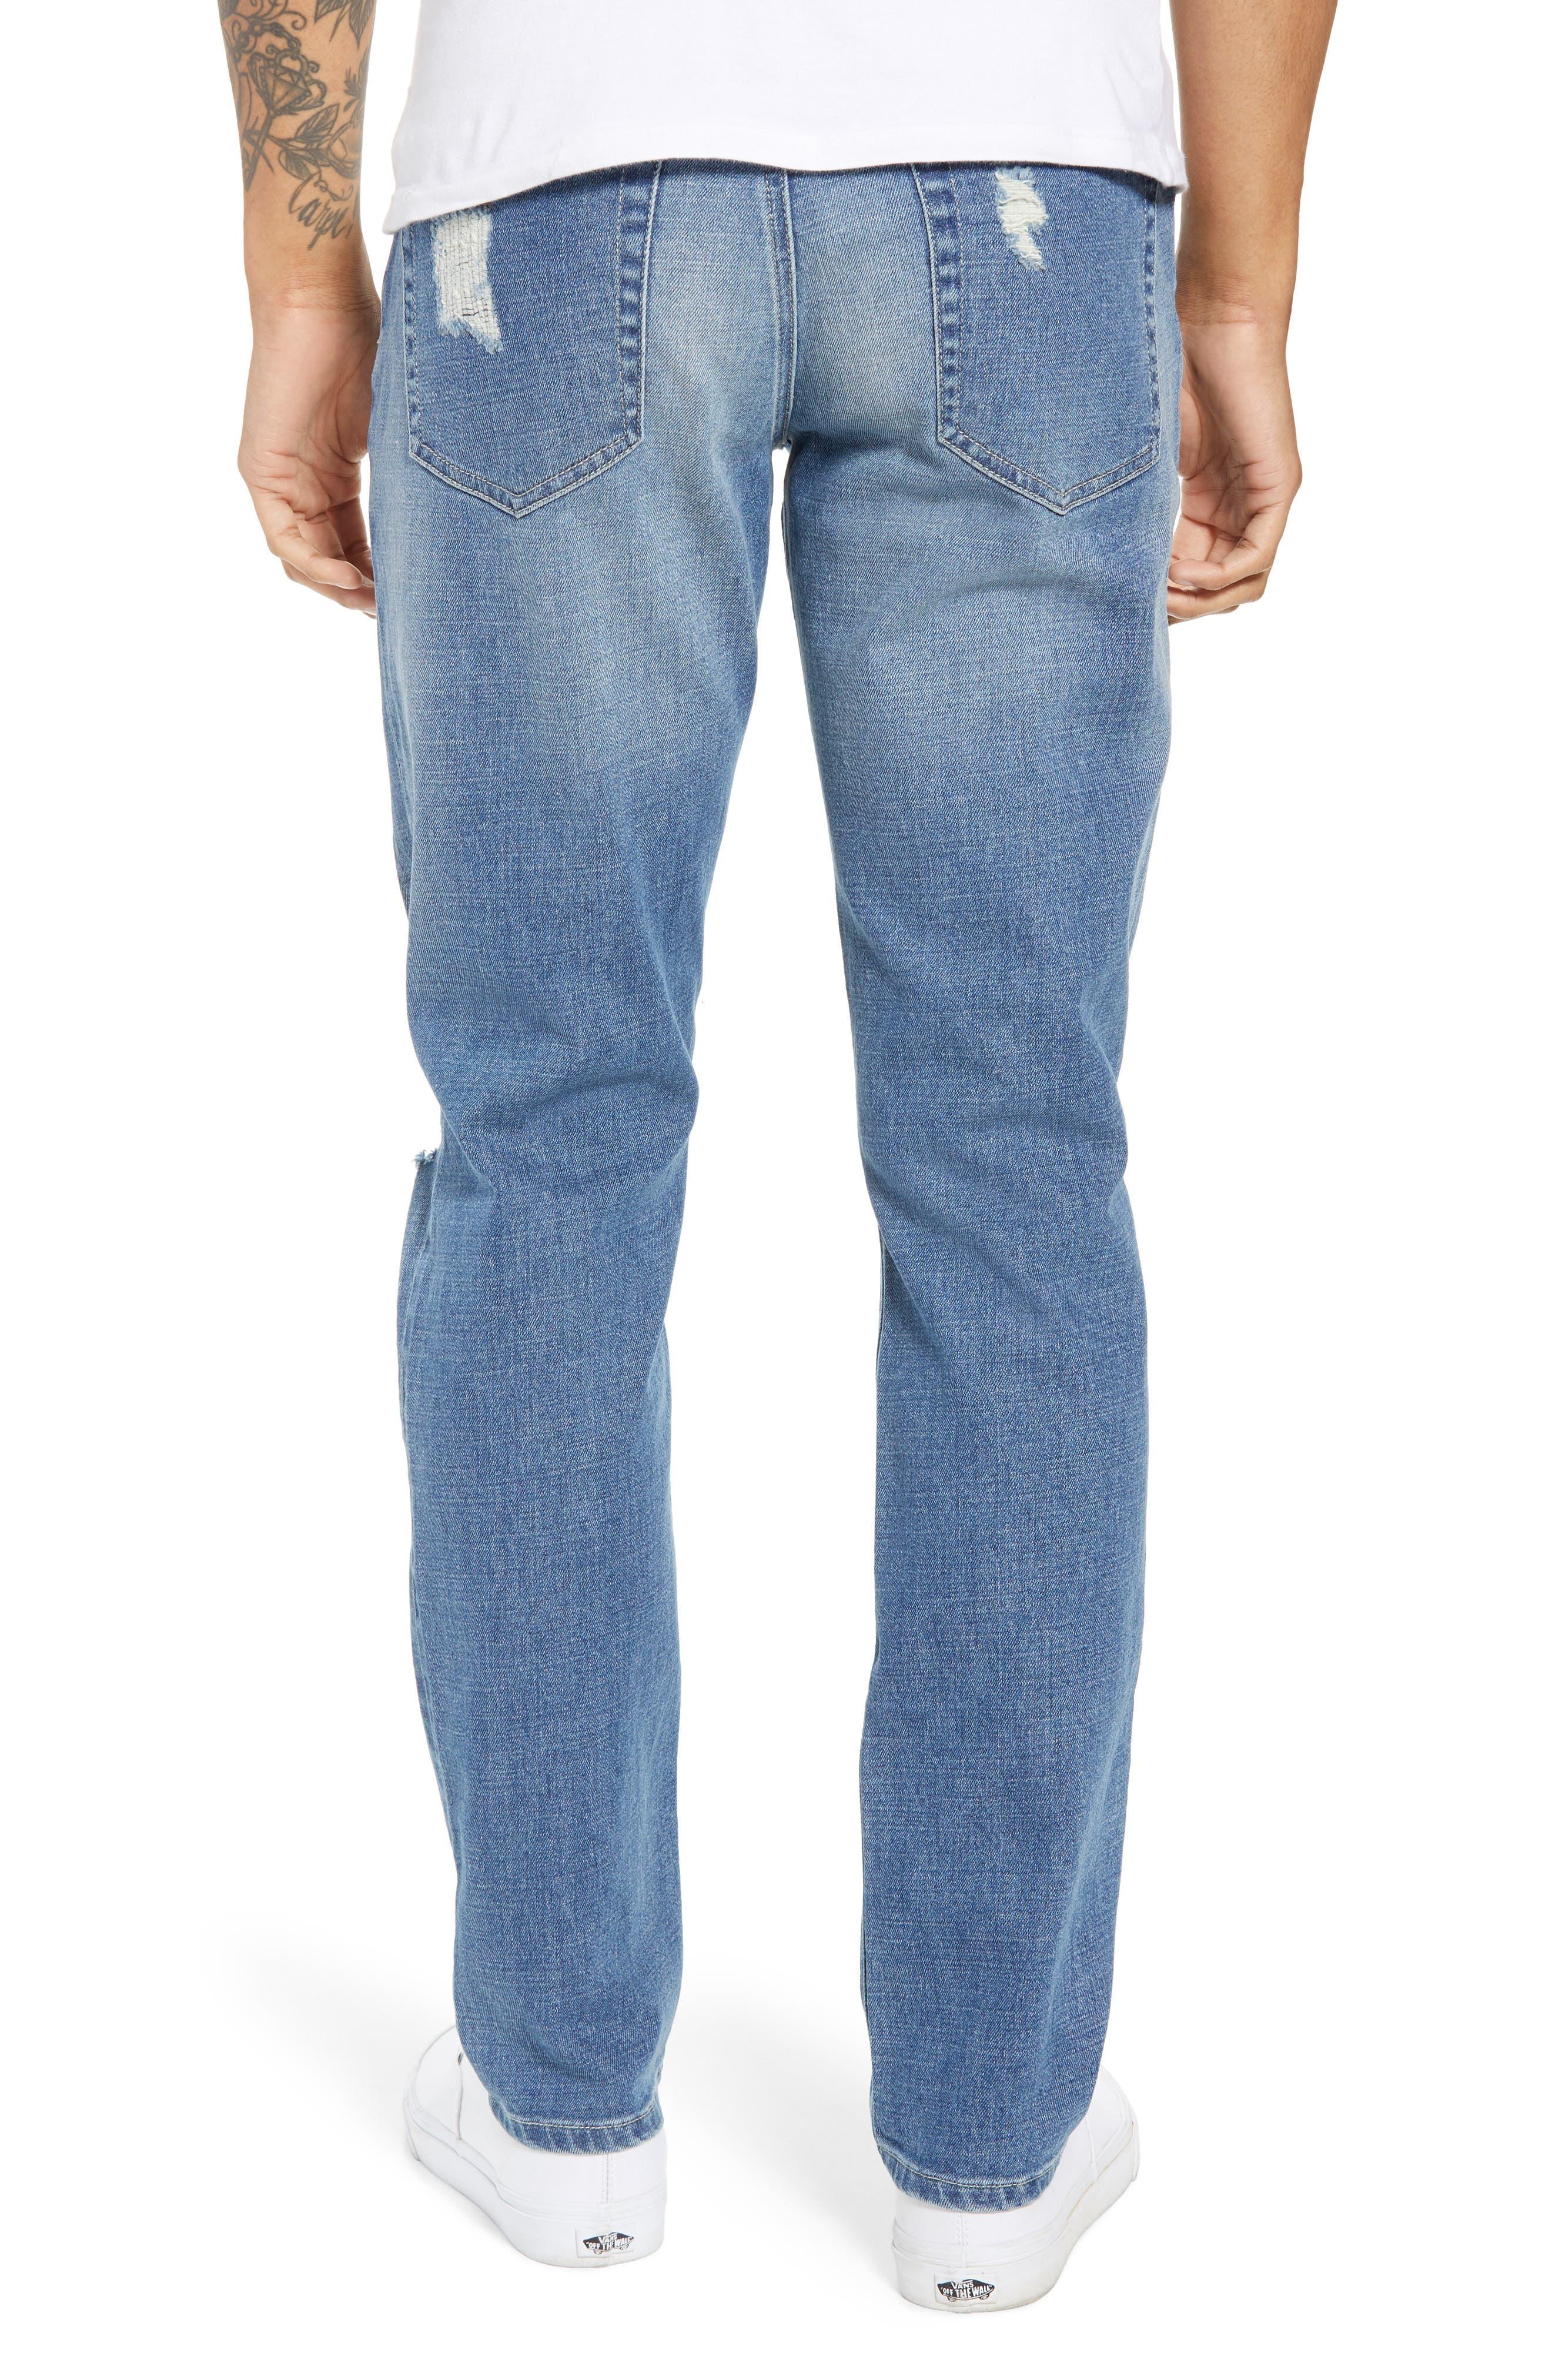 Rip & Repair Stretch Slim Jeans,                             Alternate thumbnail 2, color,                             BLUE HETFIELD WASH